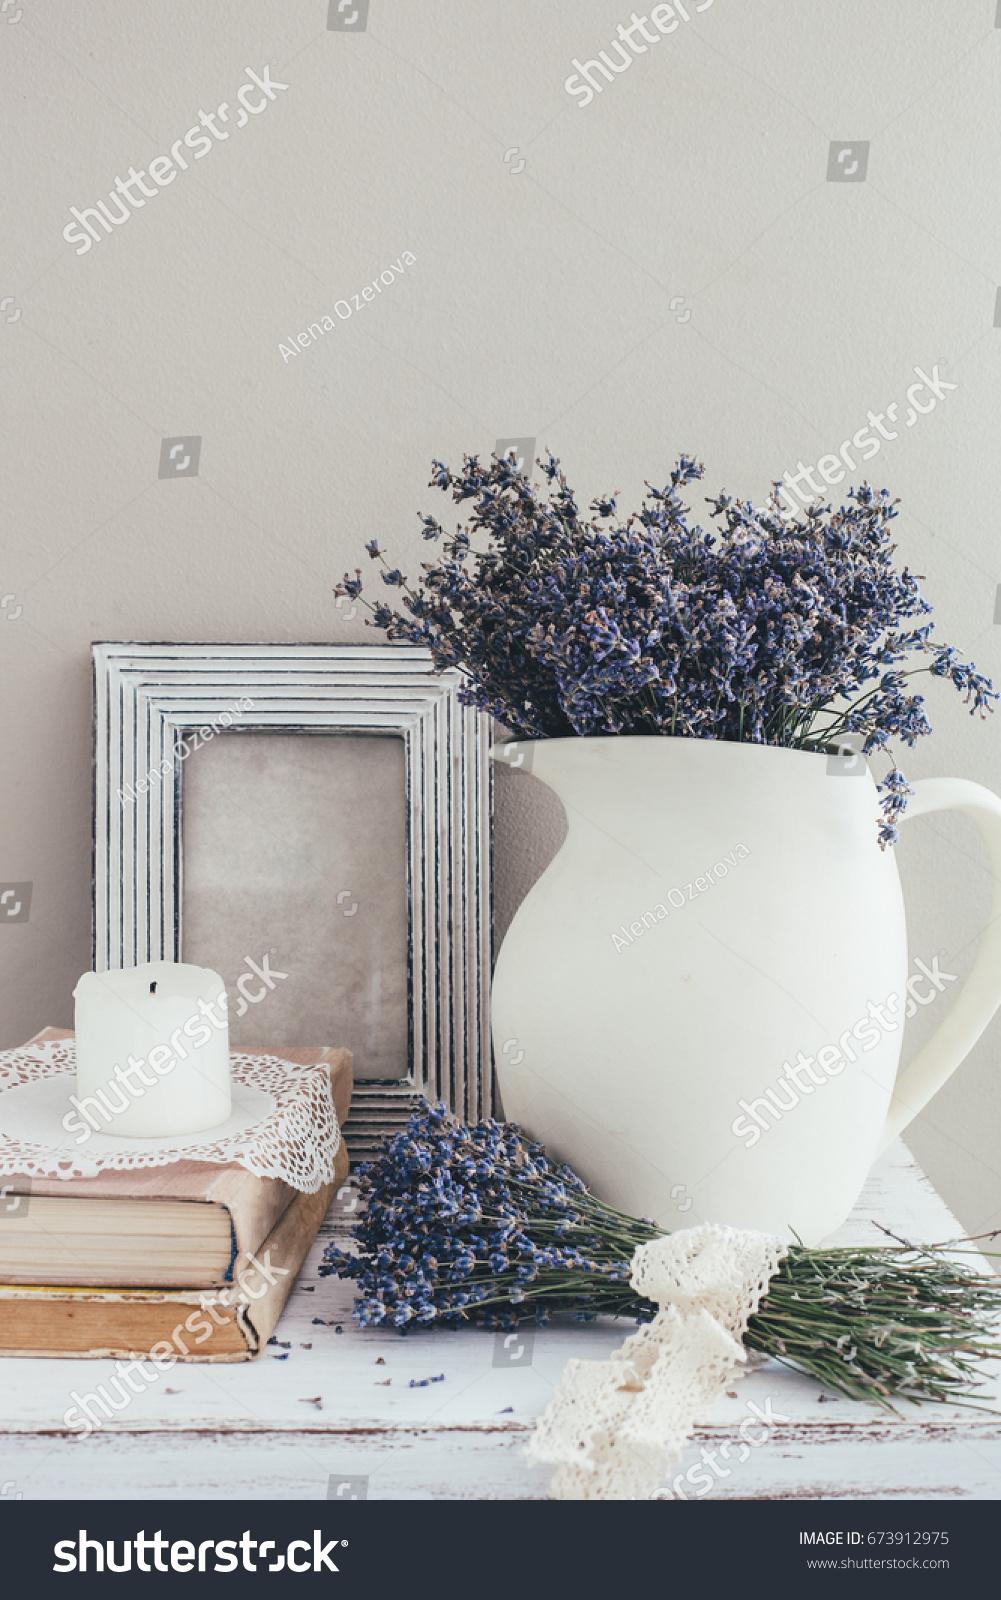 Shabby Chic Interior Decor Farmhouse Lavender Stock Photo (Royalty ...